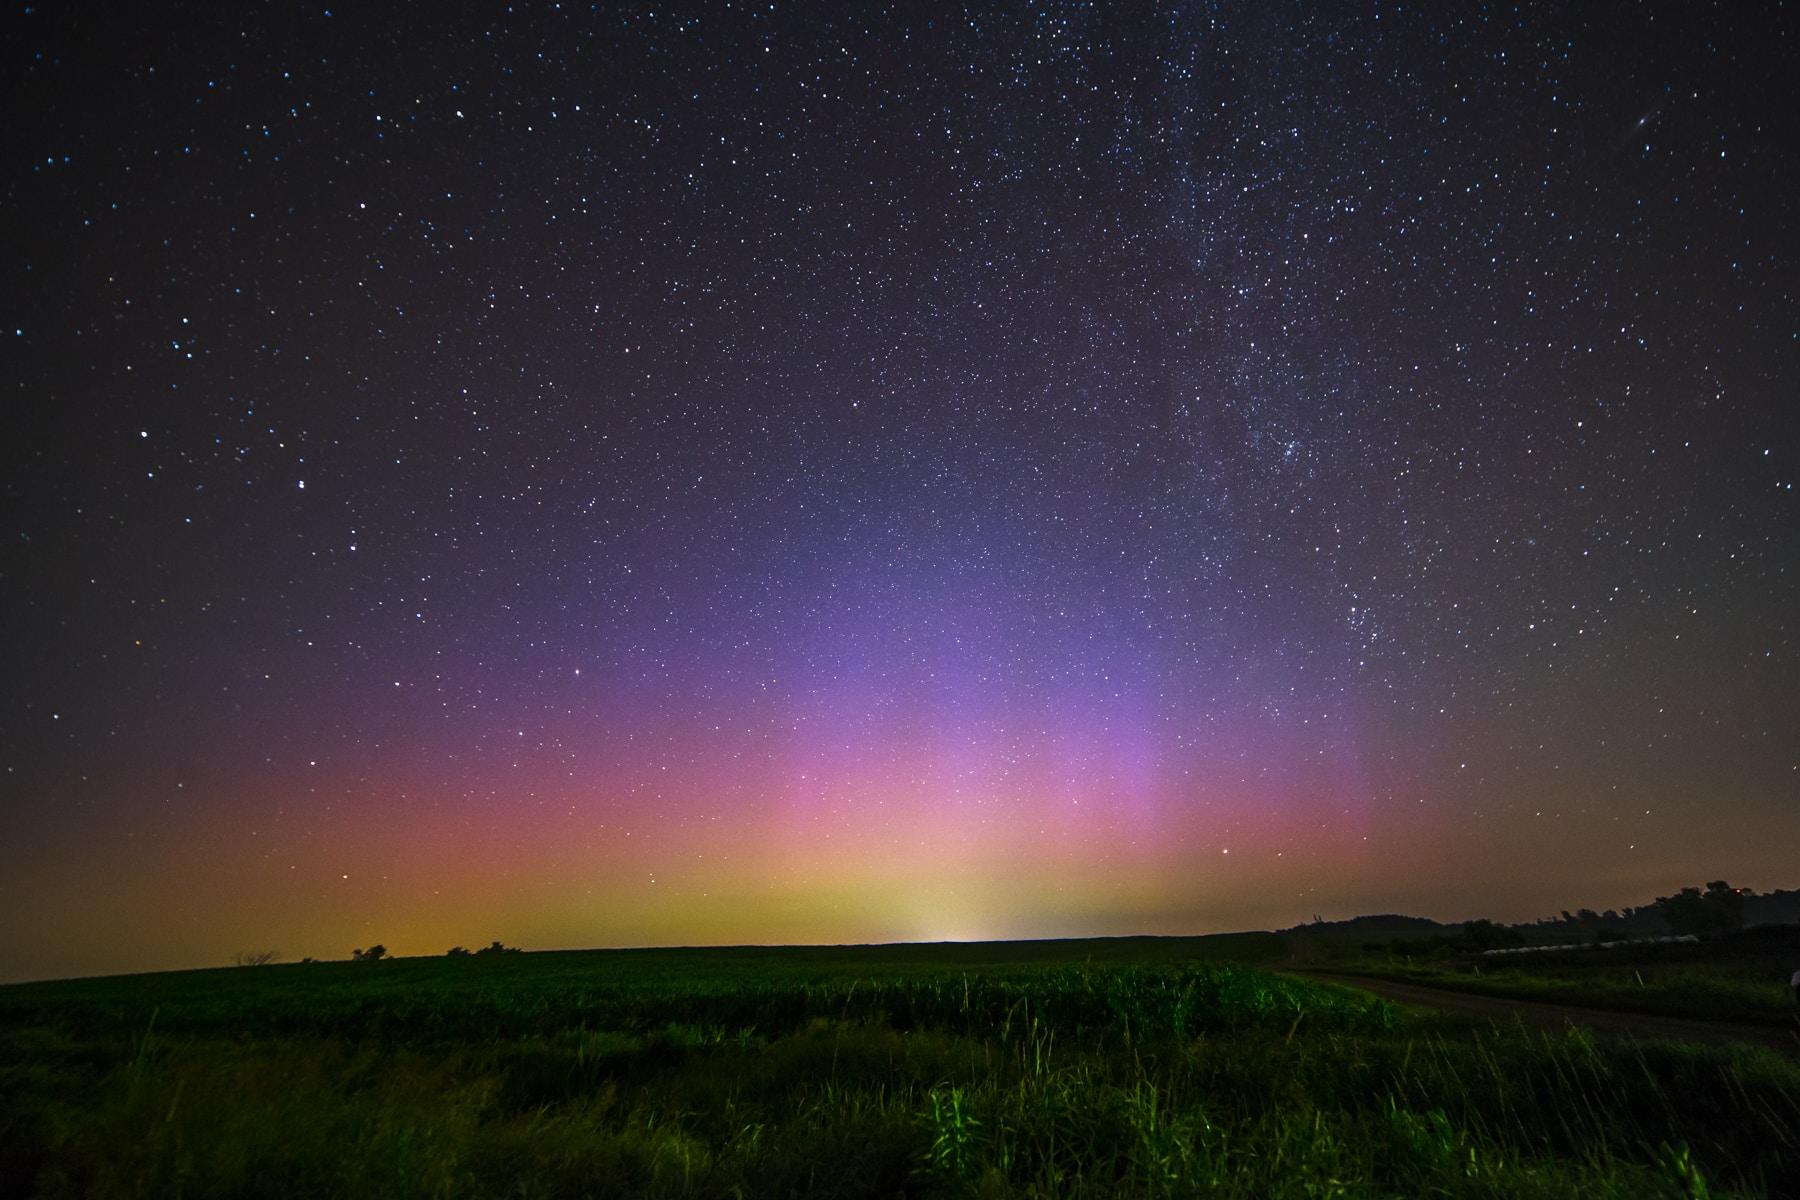 An aurora borealis and the night sky